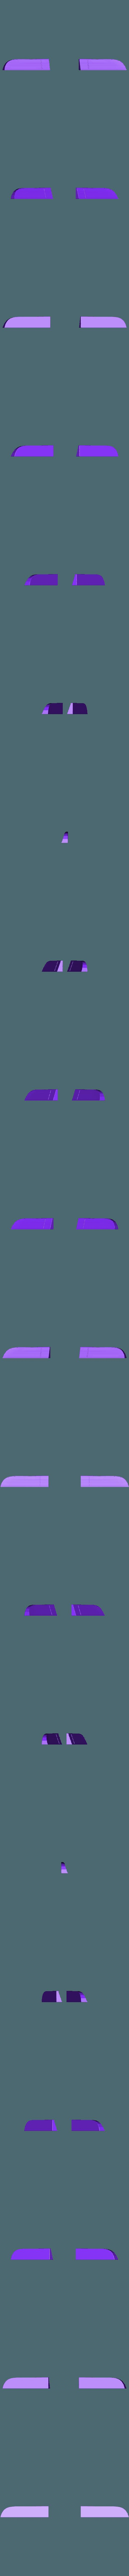 Tail-lights.stl Download free STL file Trans-Am 1977 • 3D printing design, Double_Alfa_3D